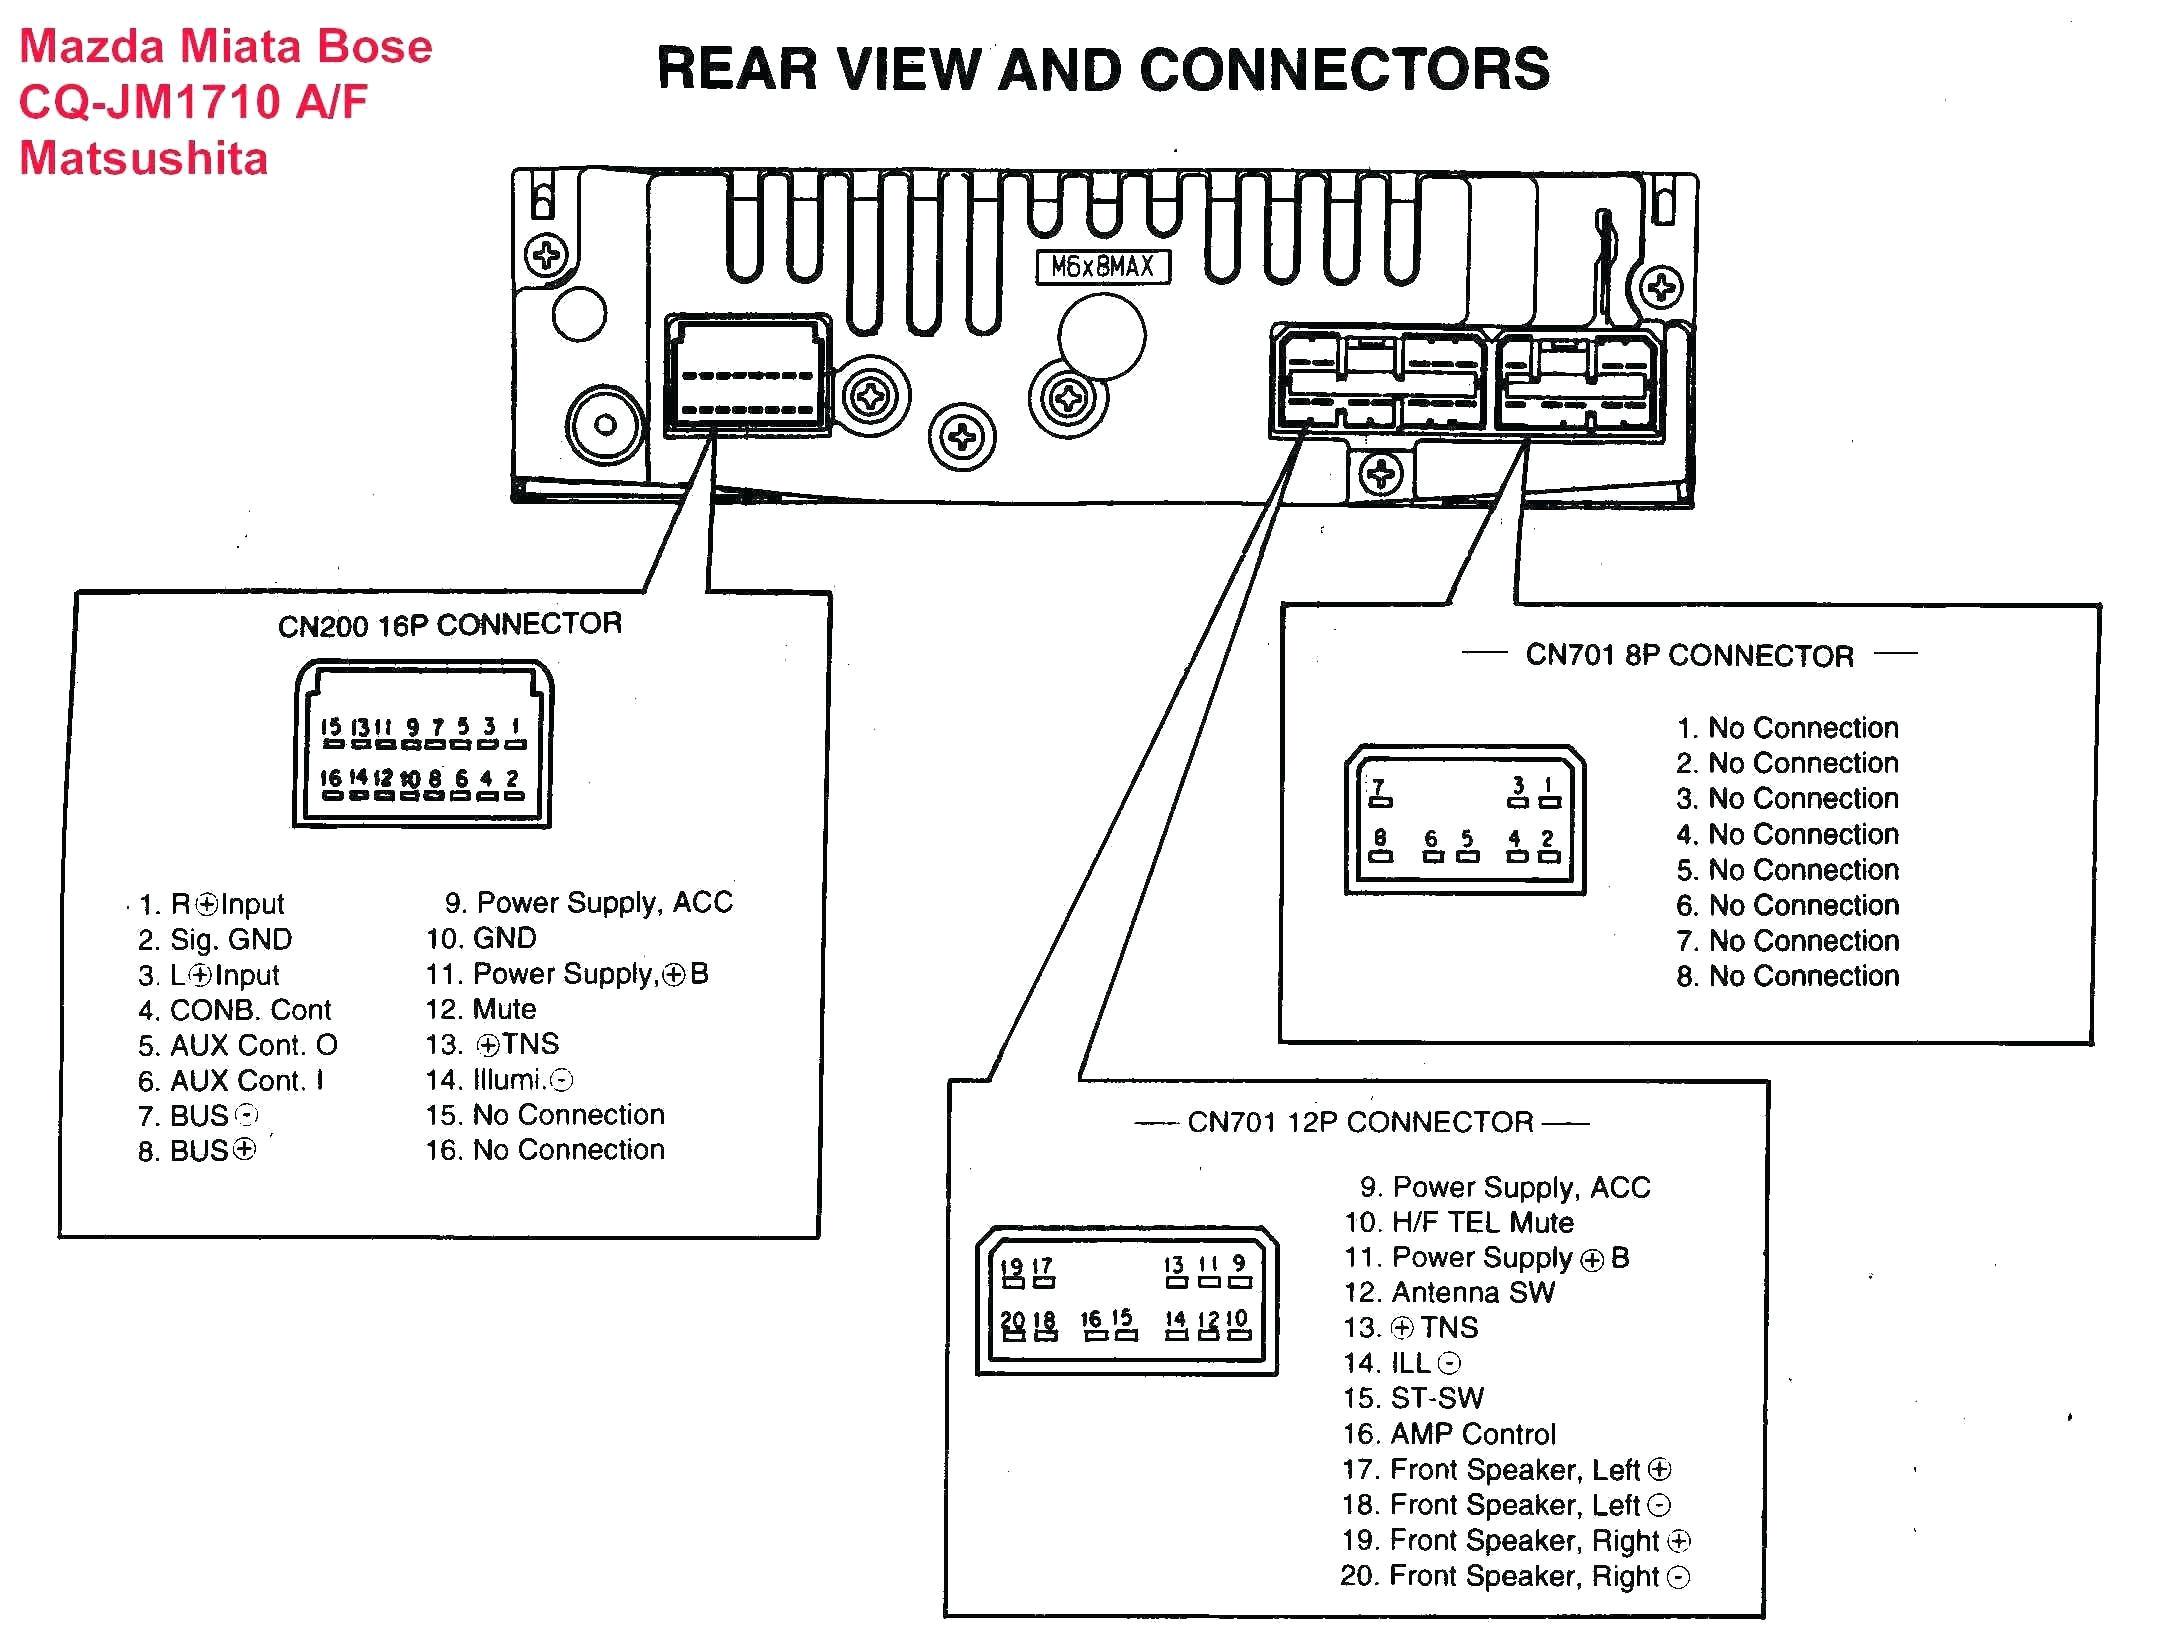 sony m 610 wiring harness diagram wiring diagram toolbox sony m 610 wiring harness diagram